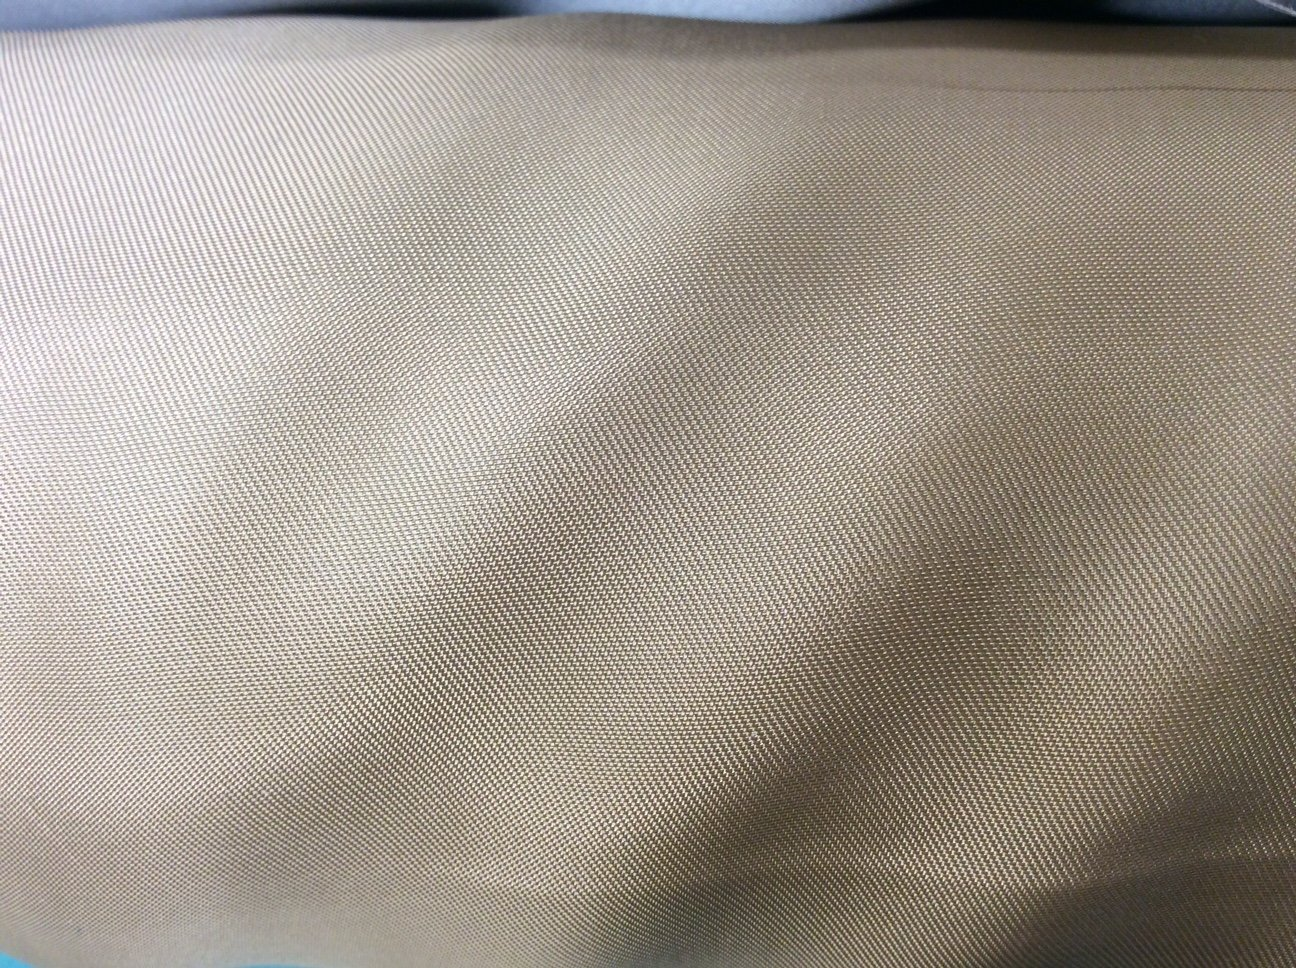 Bemberg Rayon Lining -Grey